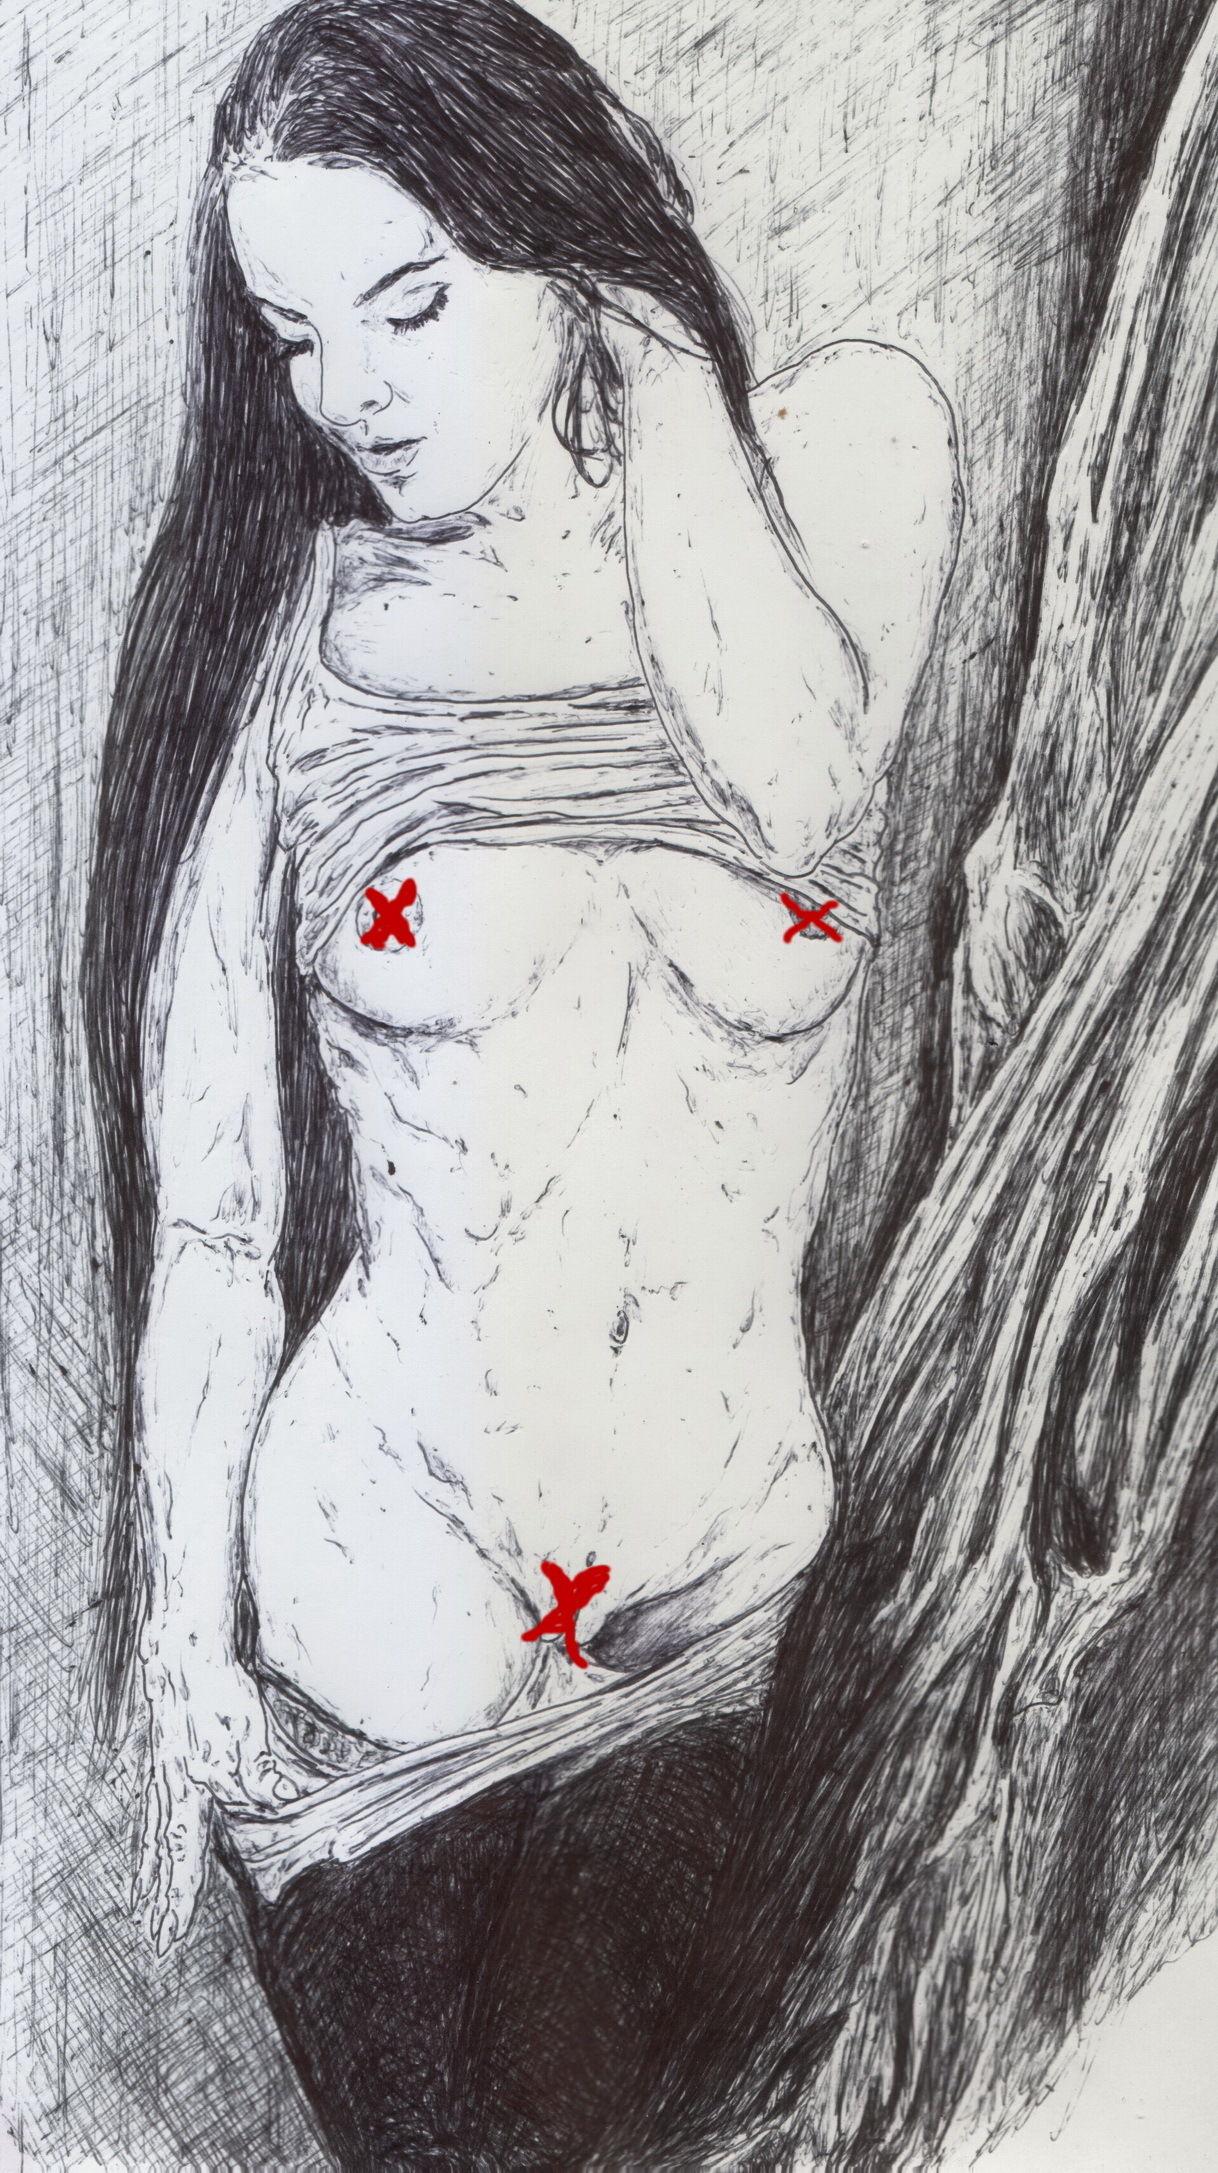 Akt Erotik Sexy Nude Frau X Erotic Woman Act Sex Girl